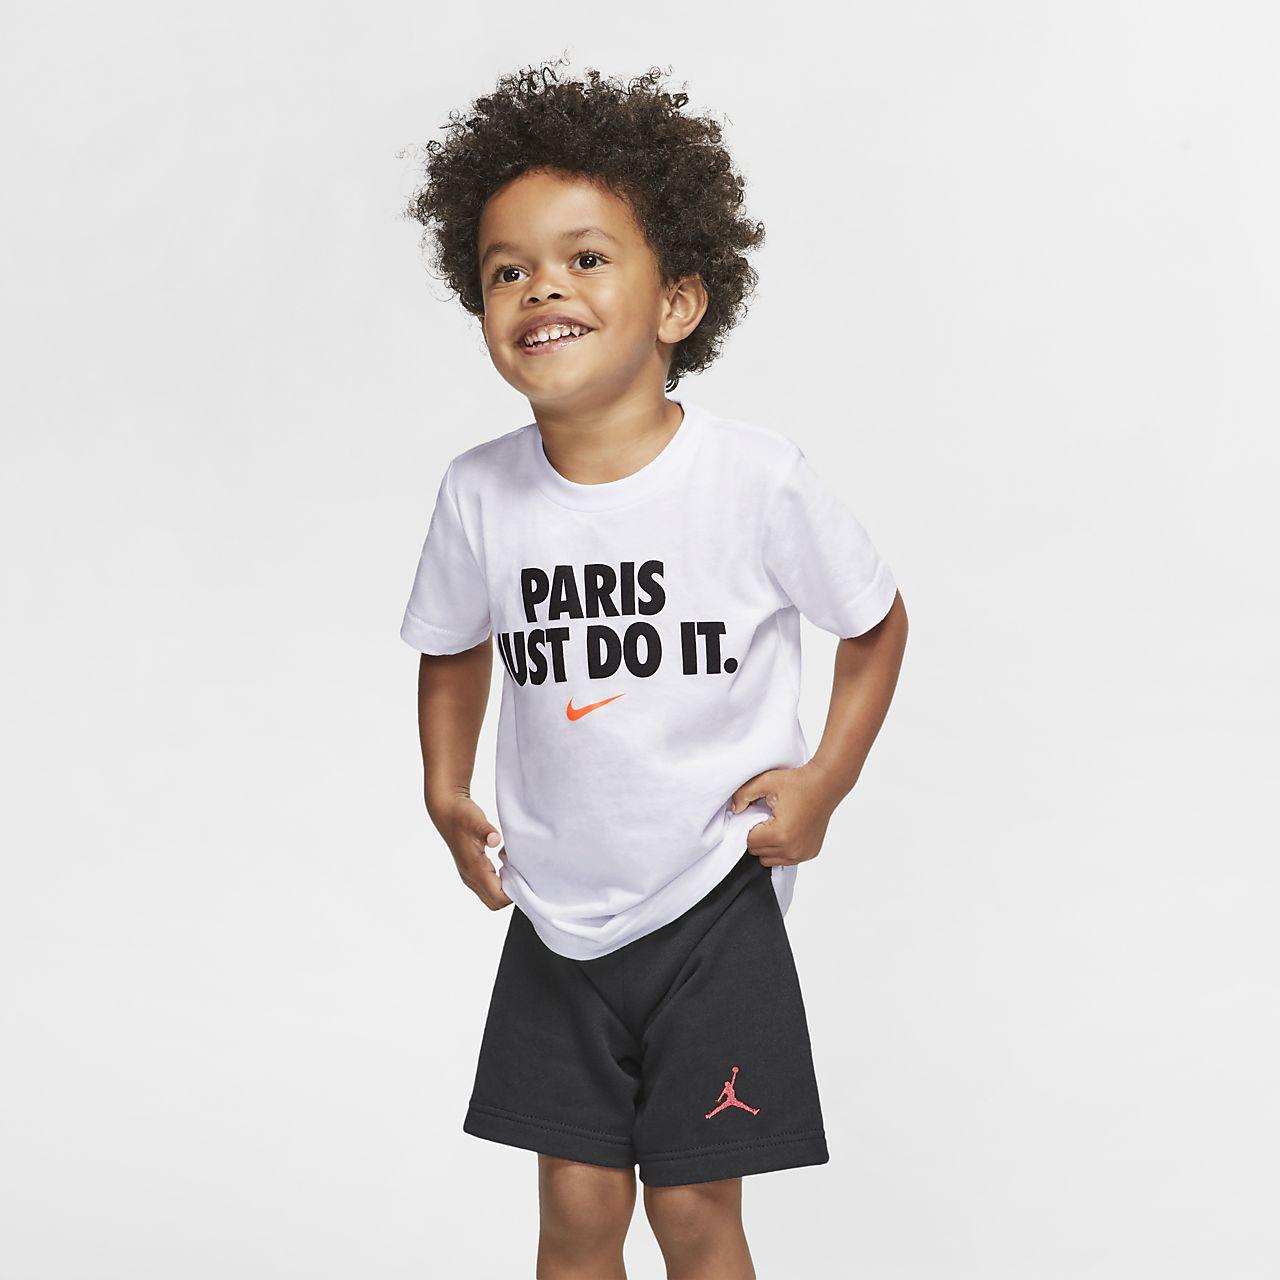 Petit Tee Nike Pour Fr Enfant Xwubzr Shirt Jdi t6atwqY